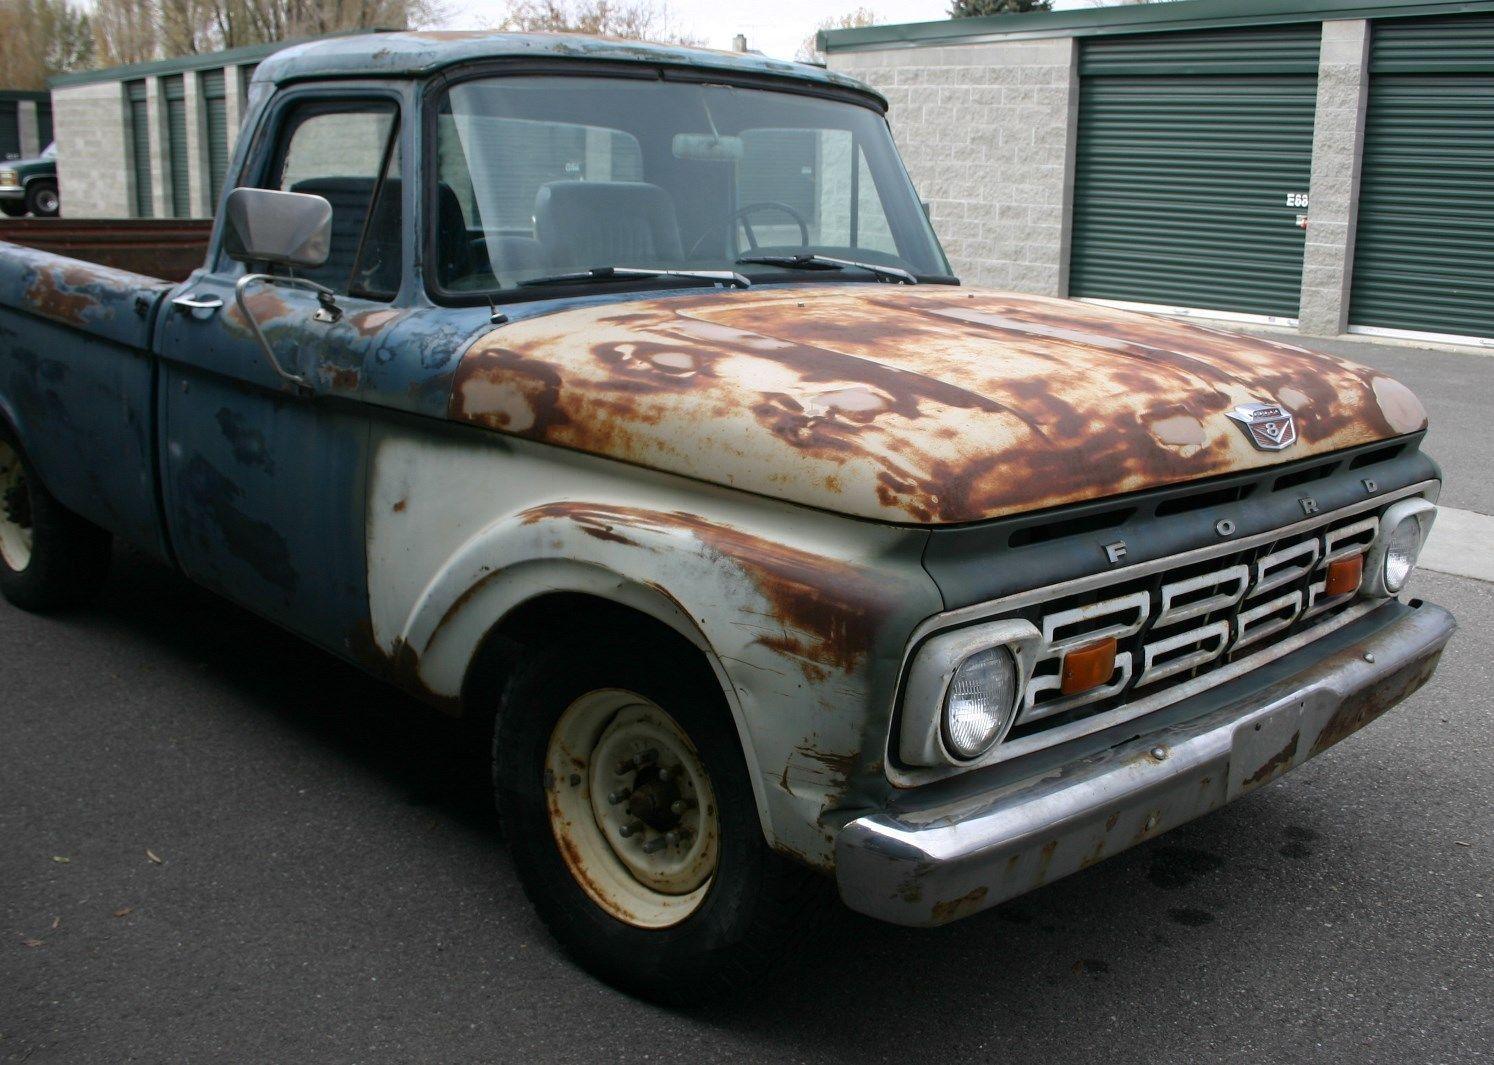 1963 ford f 250 pick up truck f250 f100 f150. Black Bedroom Furniture Sets. Home Design Ideas